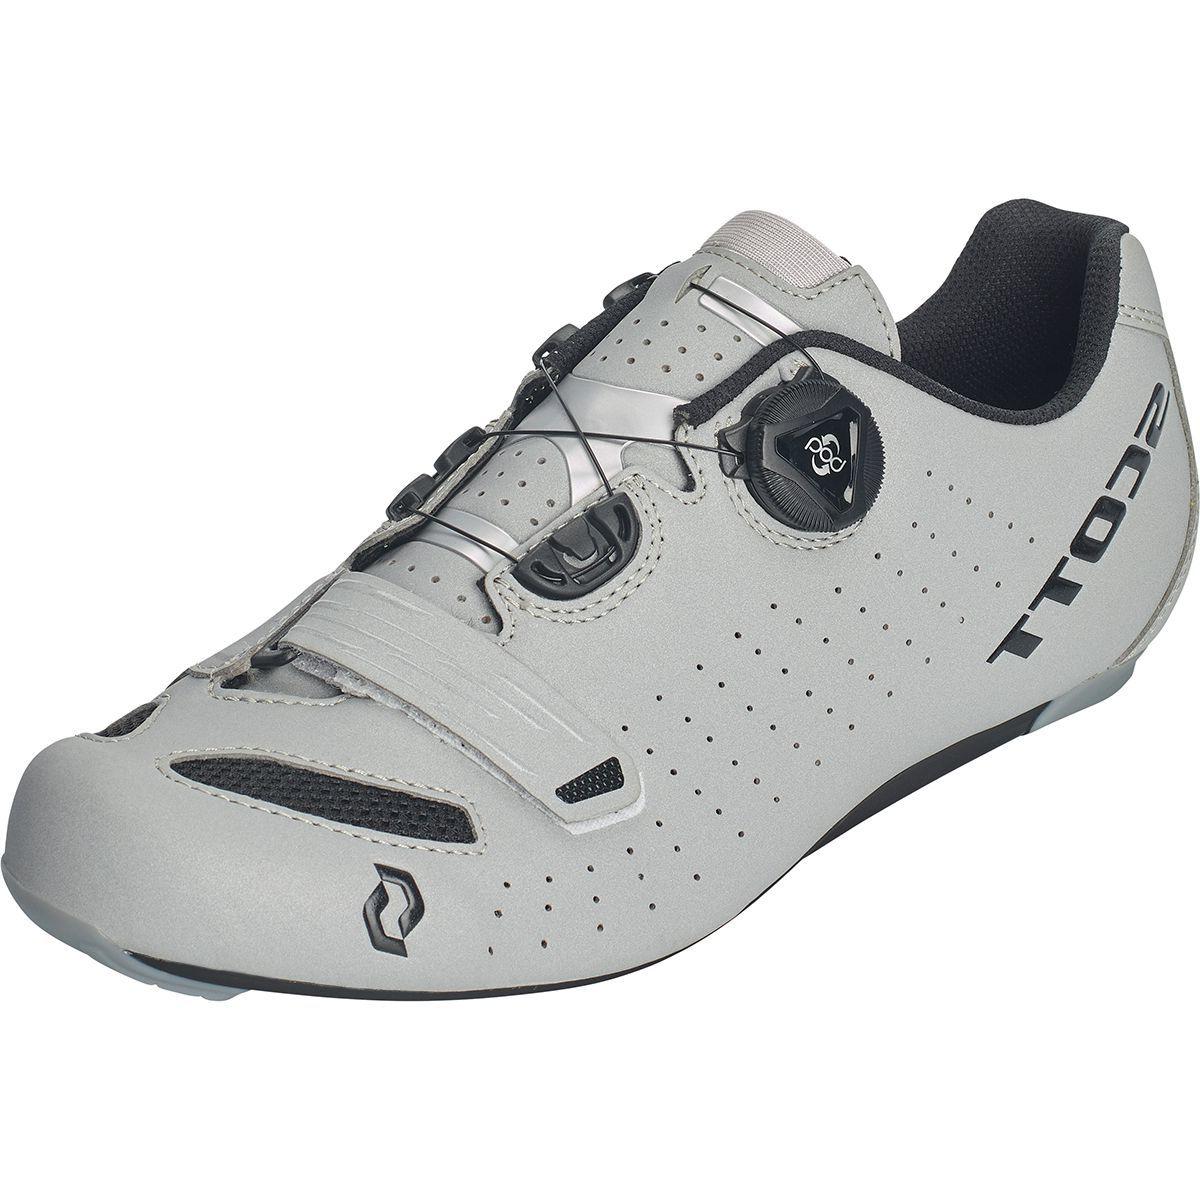 Scott Road Comp Boa Reflective Lady Cycling Shoe - Women's